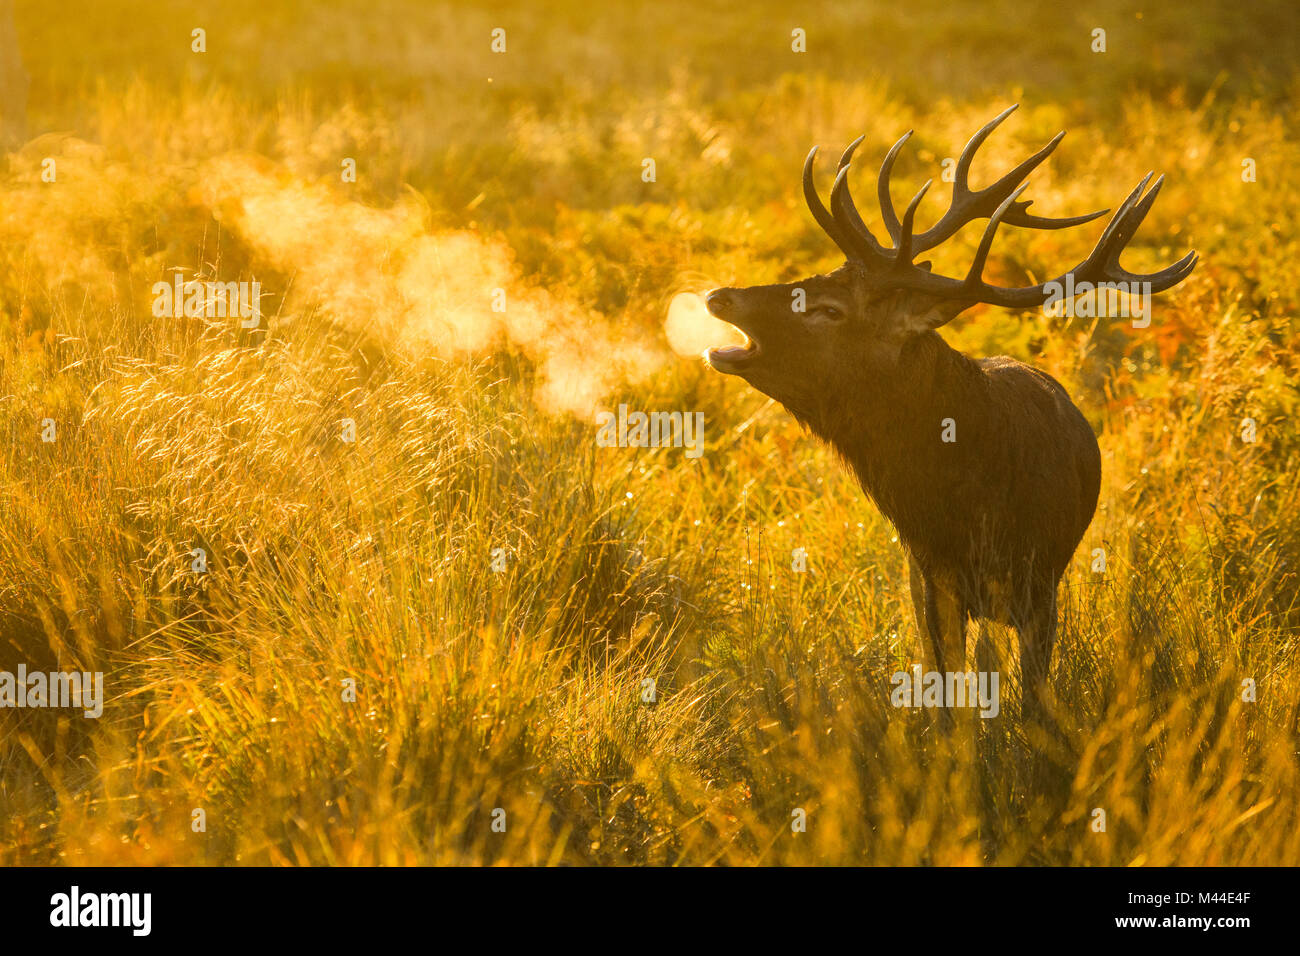 Red Deer (Cervus elaphus). Hirsch Gebrüll bei Sonnenaufgang während der Brunft, Richmond Park, London, Stockbild